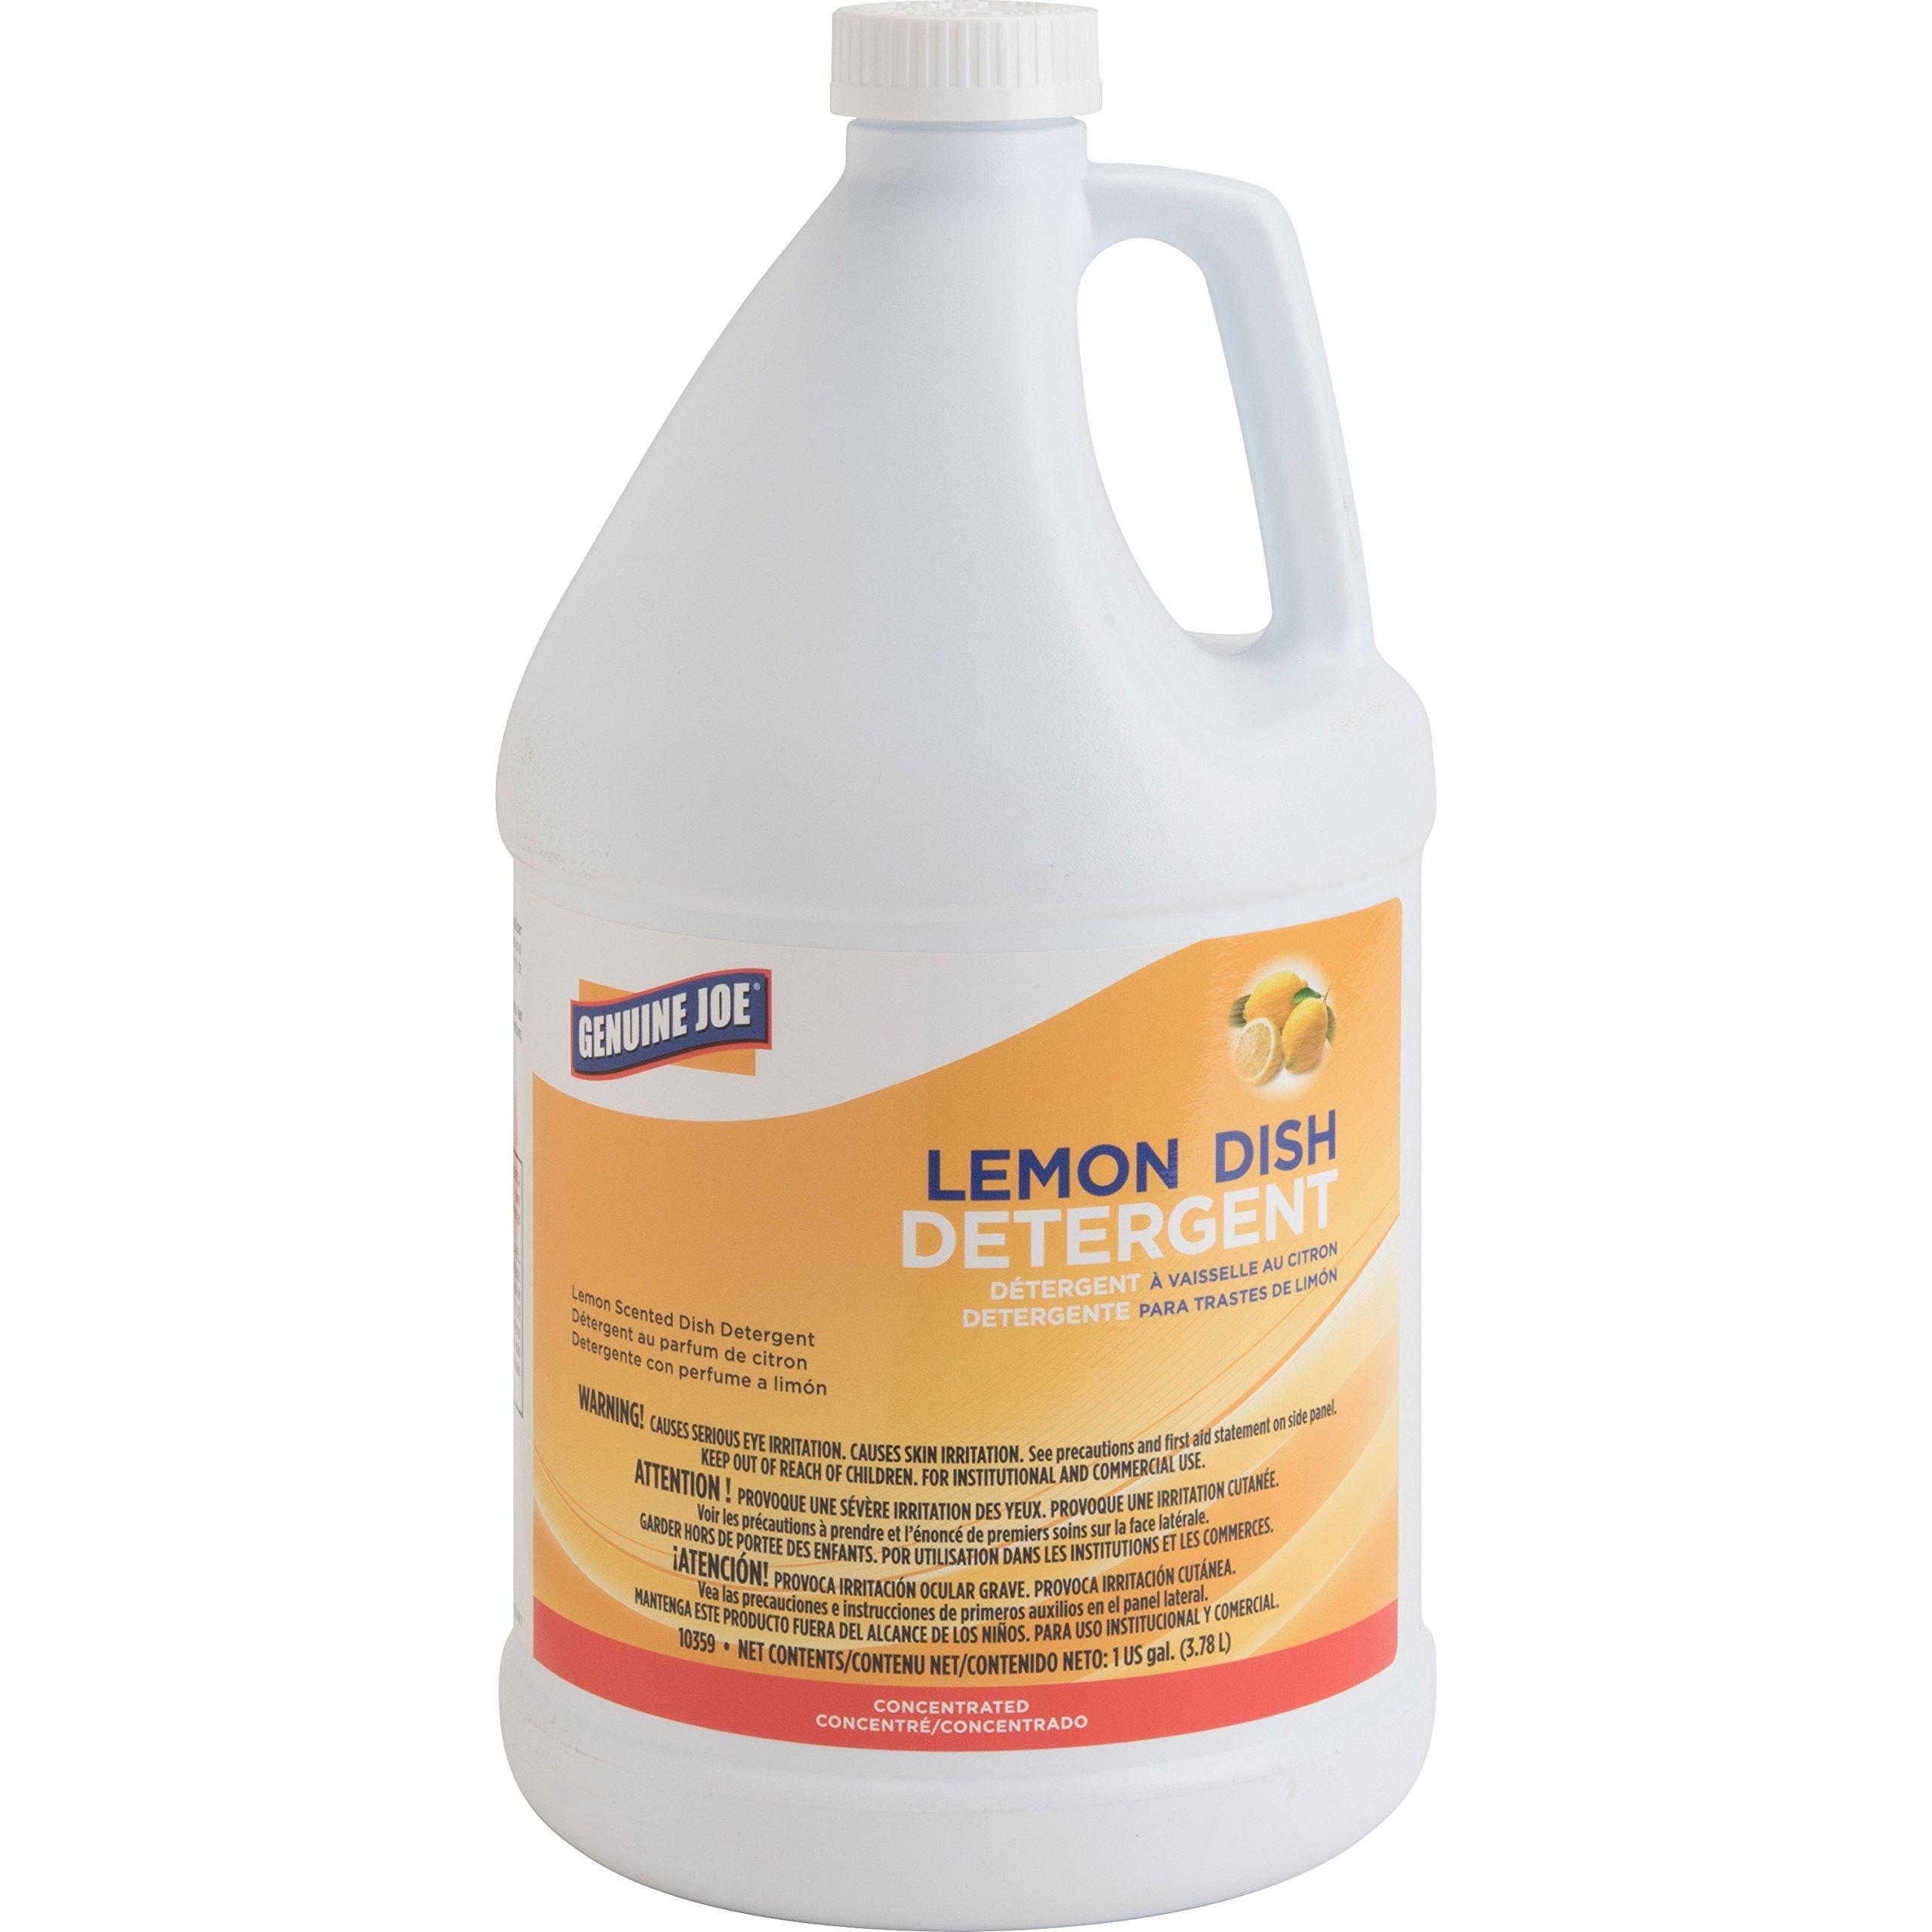 Genuine Joe GJO10359 Lemon Scent Gallon Dish Detergent, 128oz by Genuine Joe